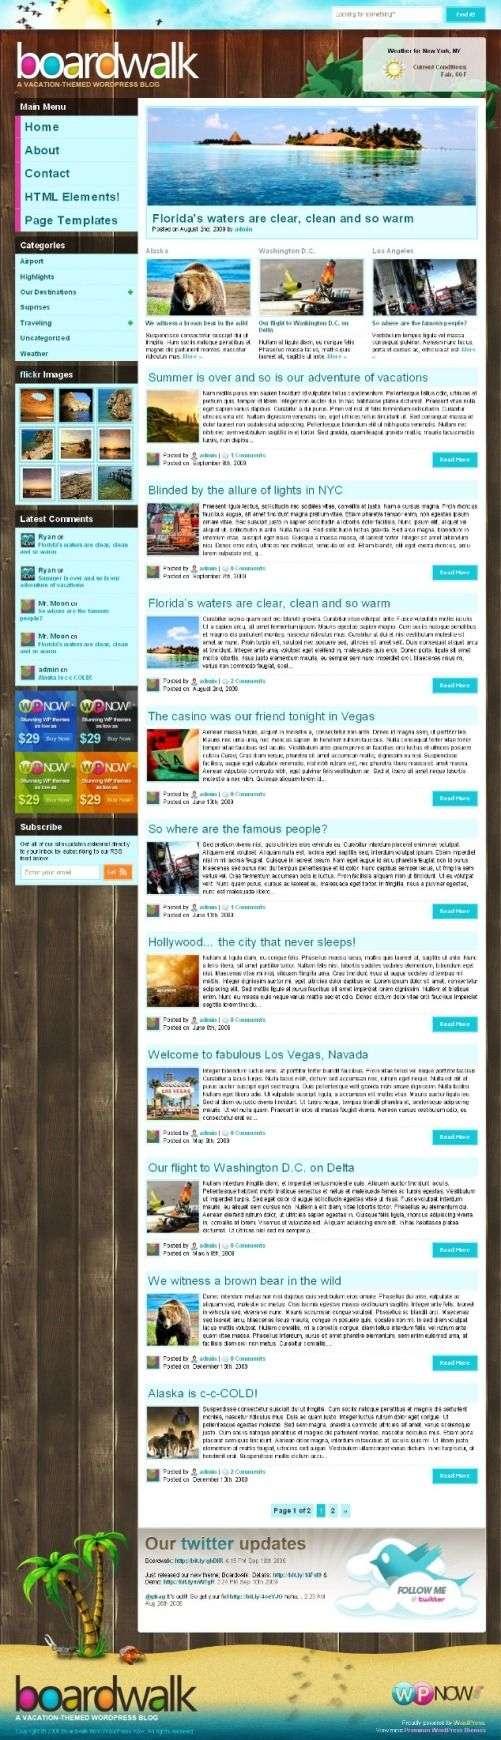 broadwalk wpnow avjthemescom1 - BroadWalk Wordpress Theme